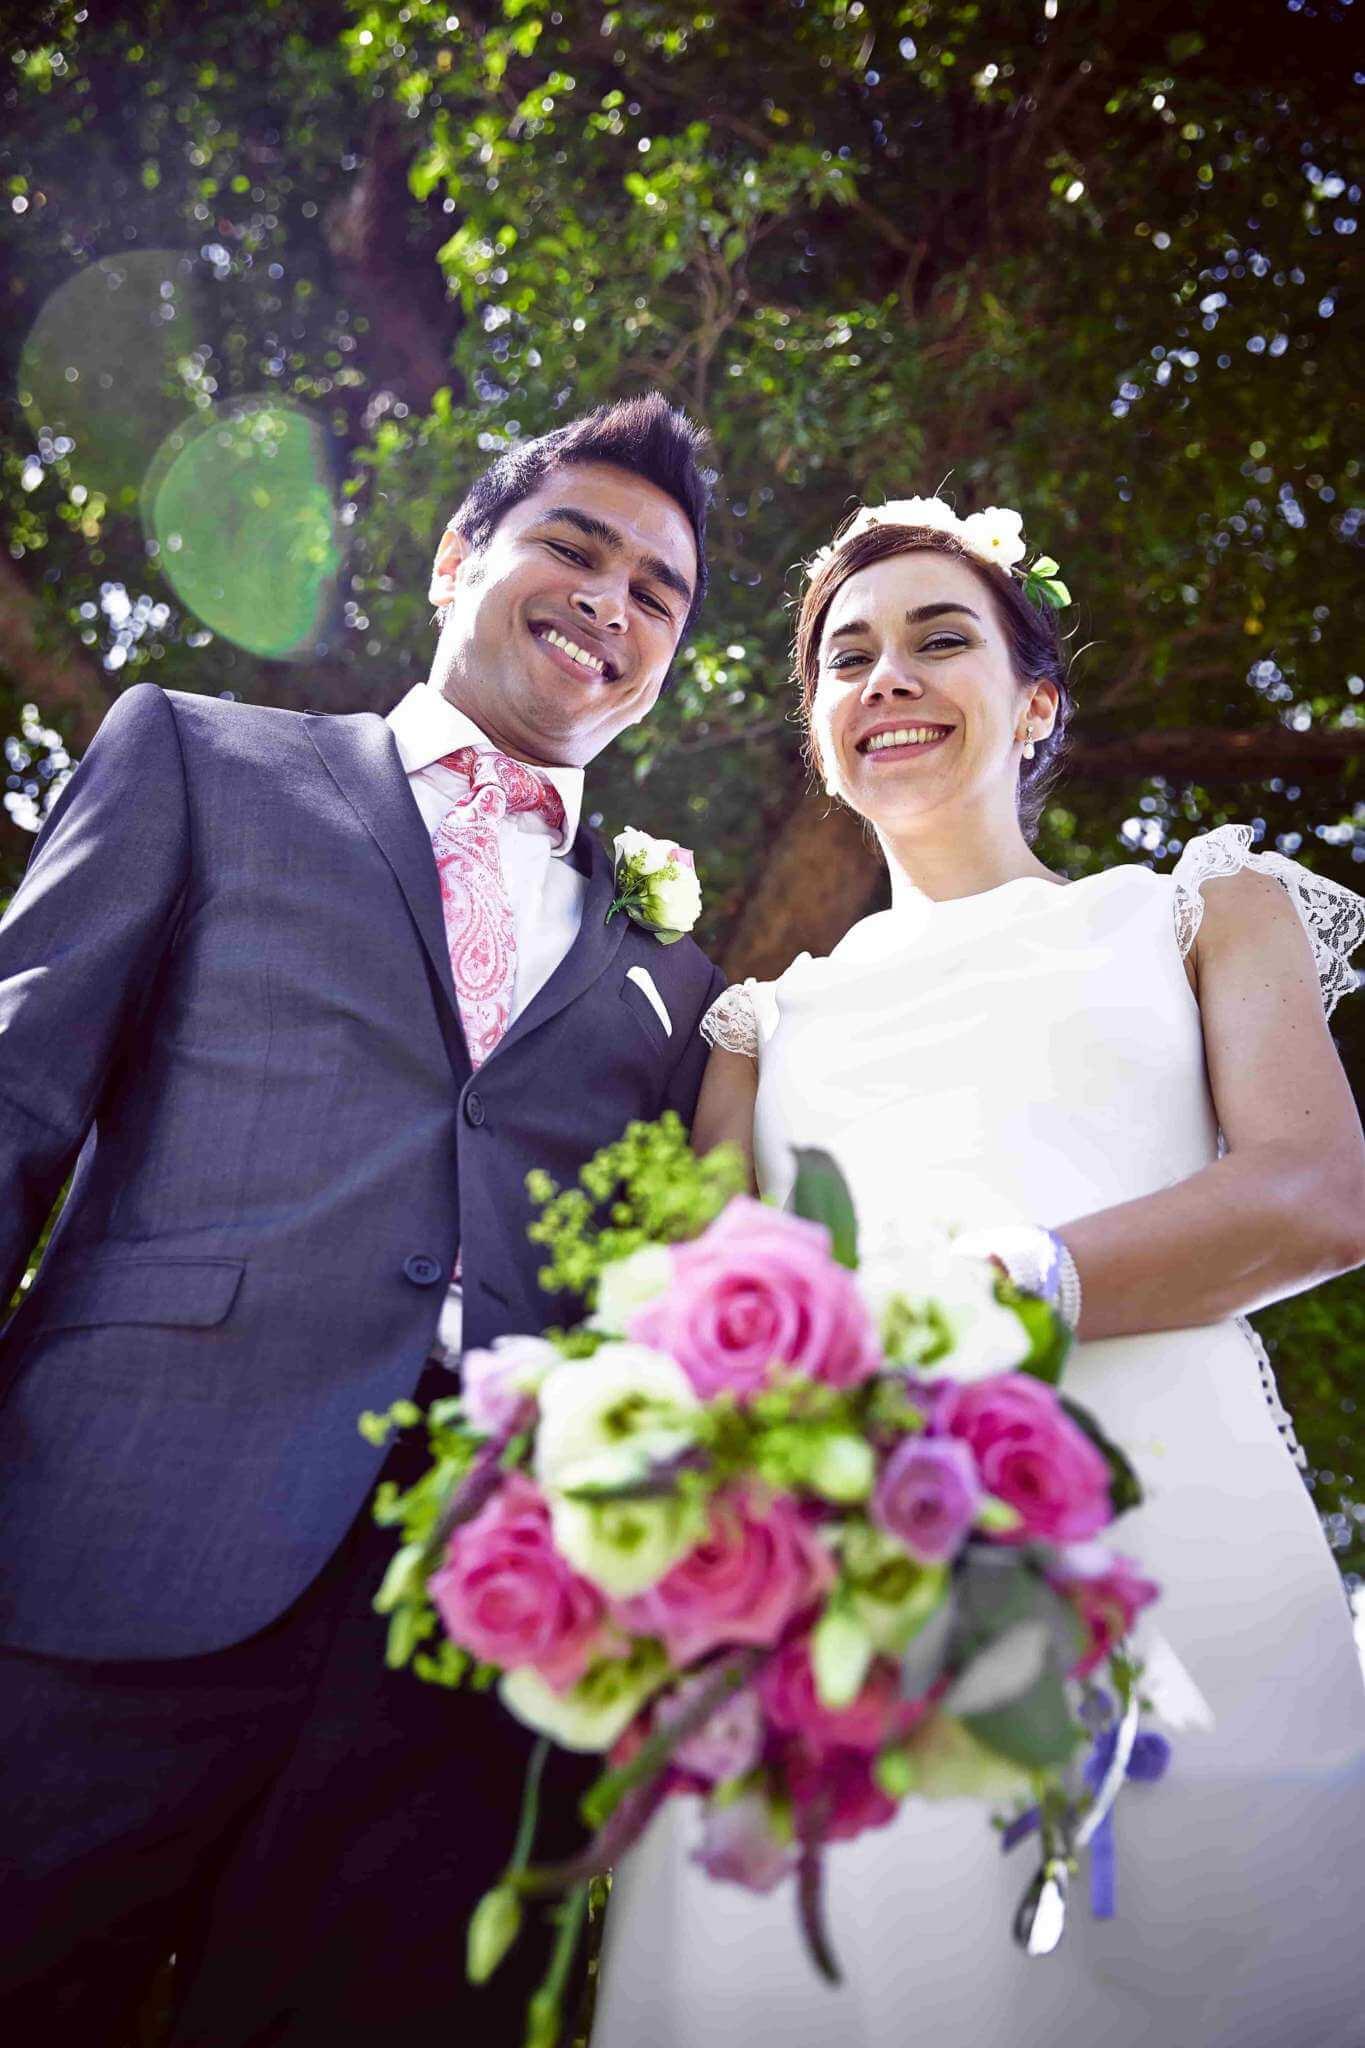 Wedding photography and videography Wolverhampton